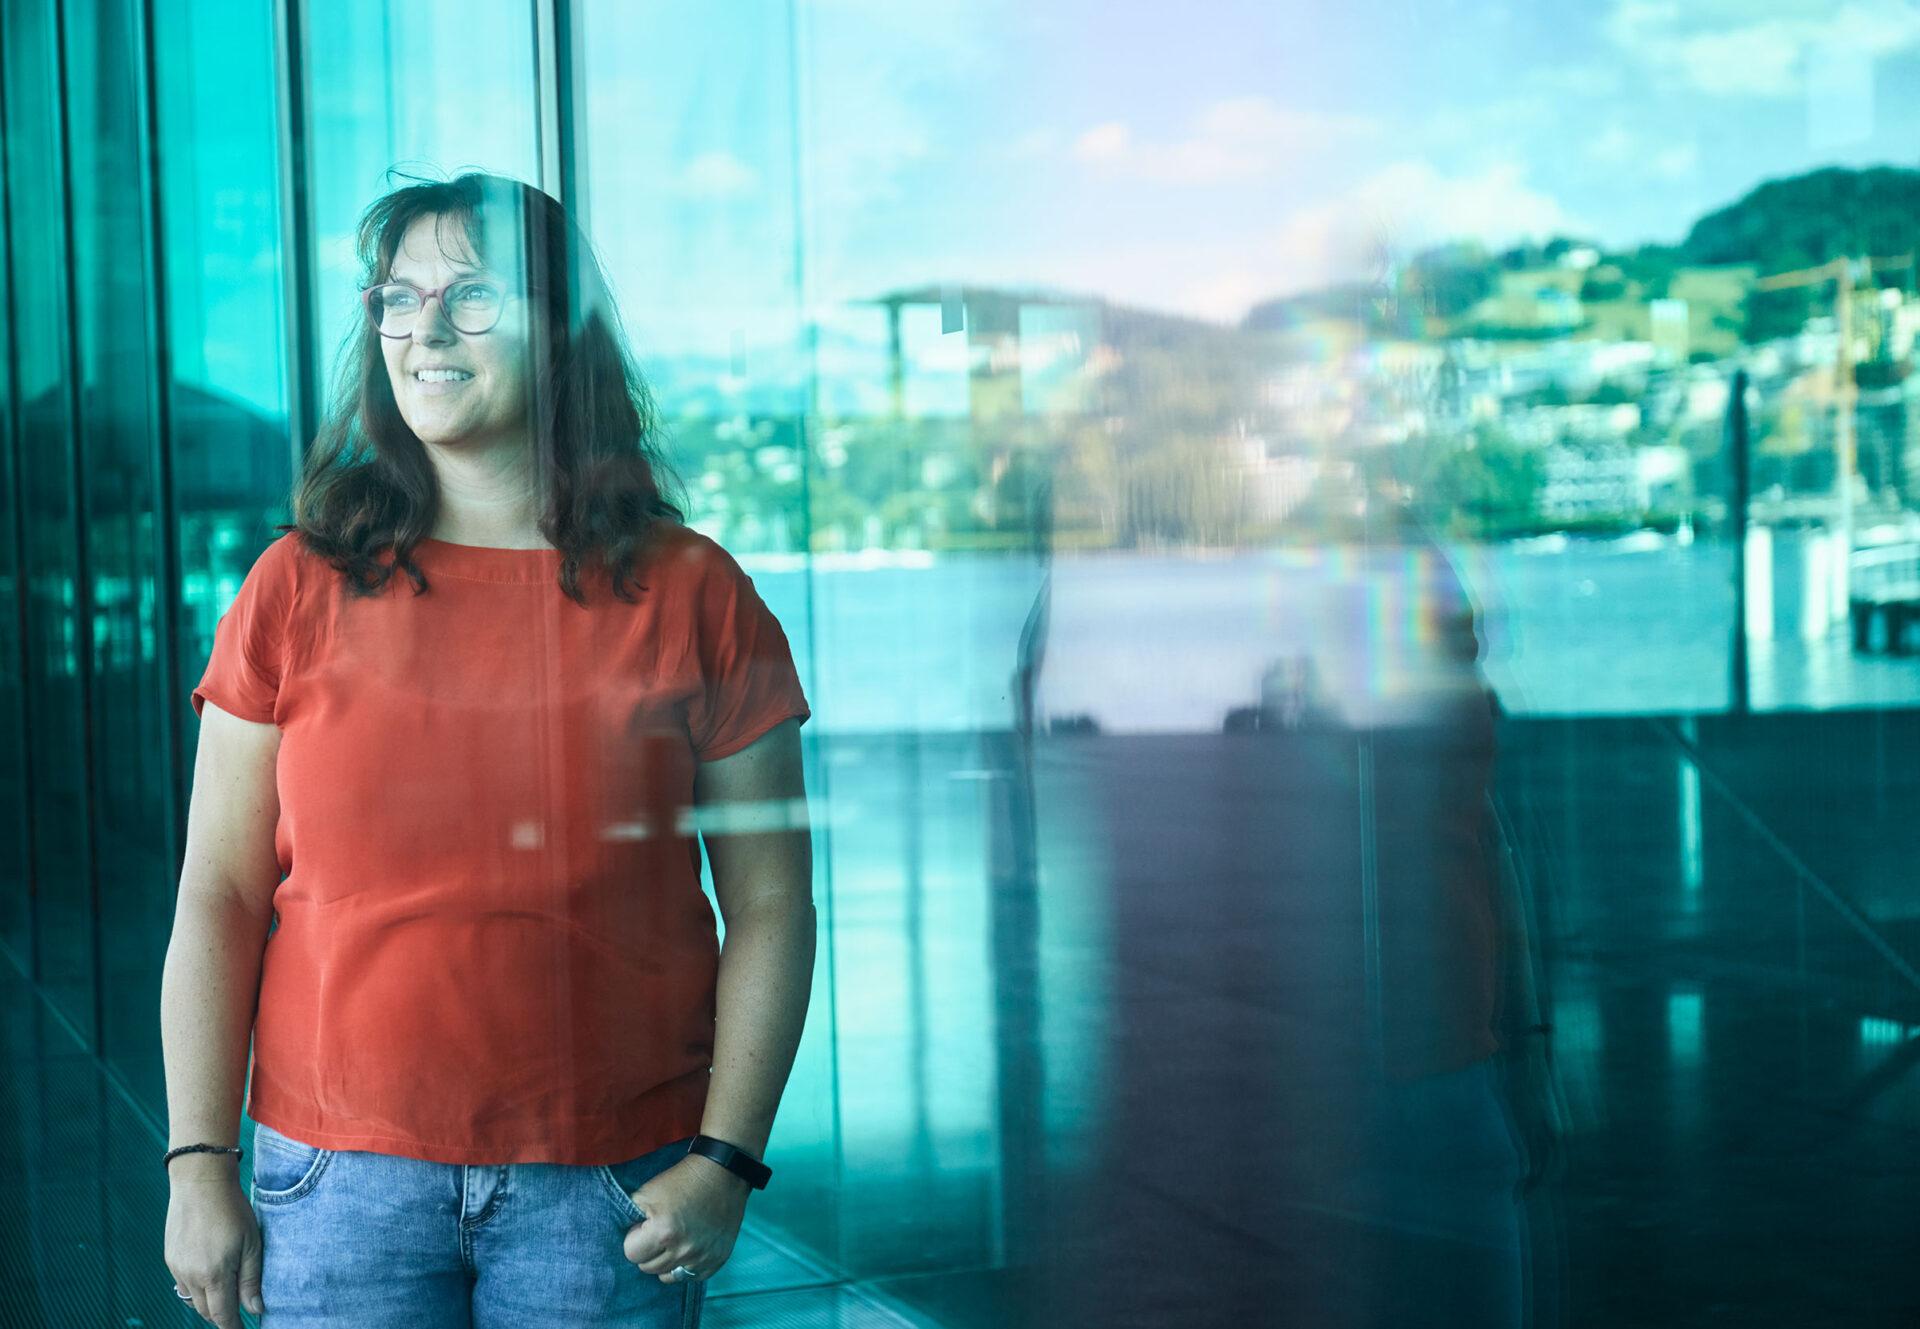 Andrea Schmid - Fachperson in der Wärchbrogg